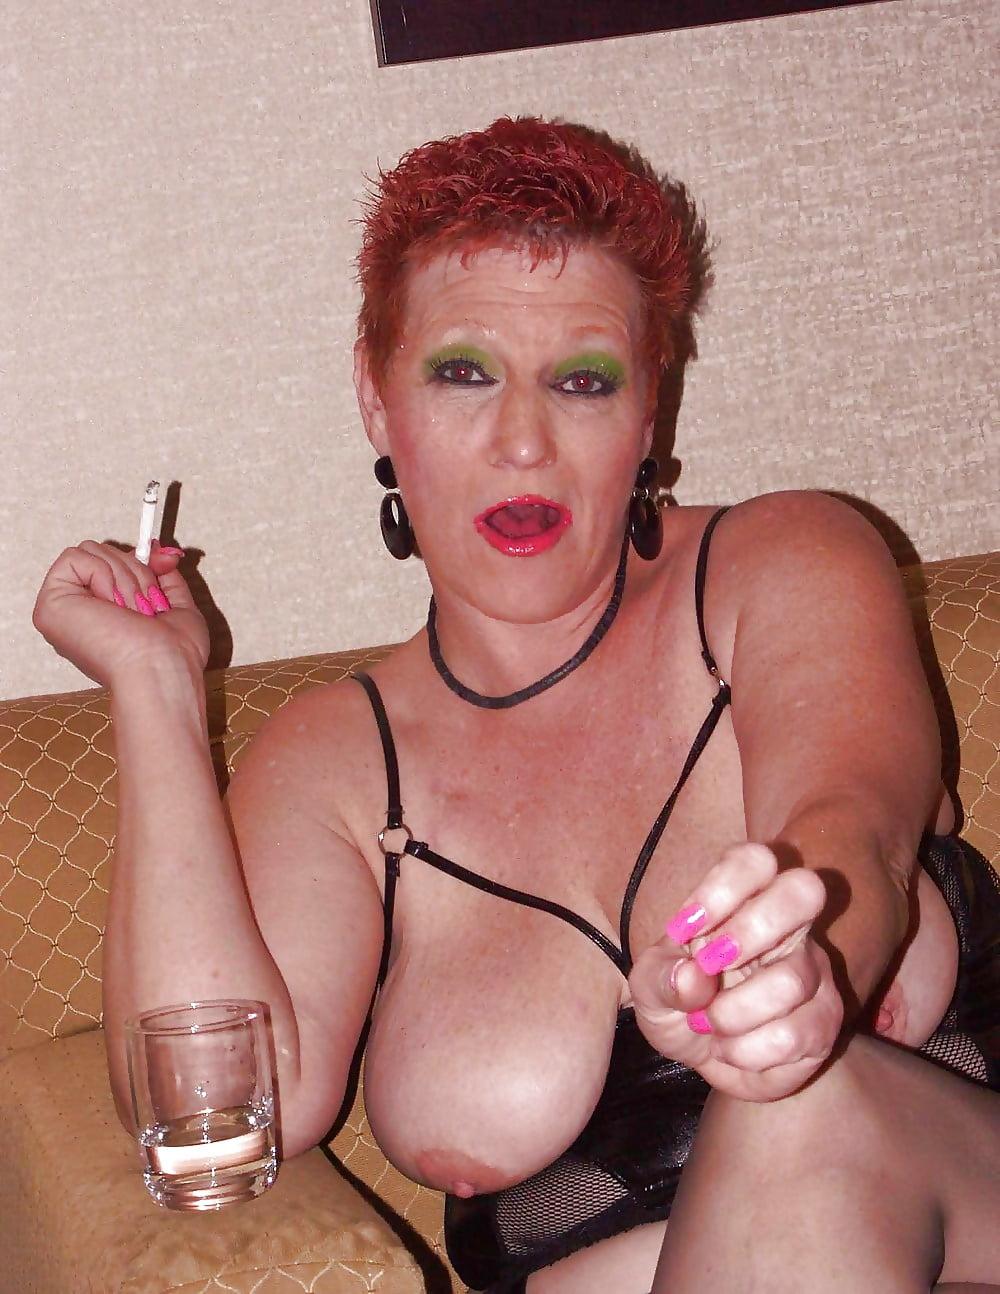 Smoking Milf Porn, Bbw Mom Pics